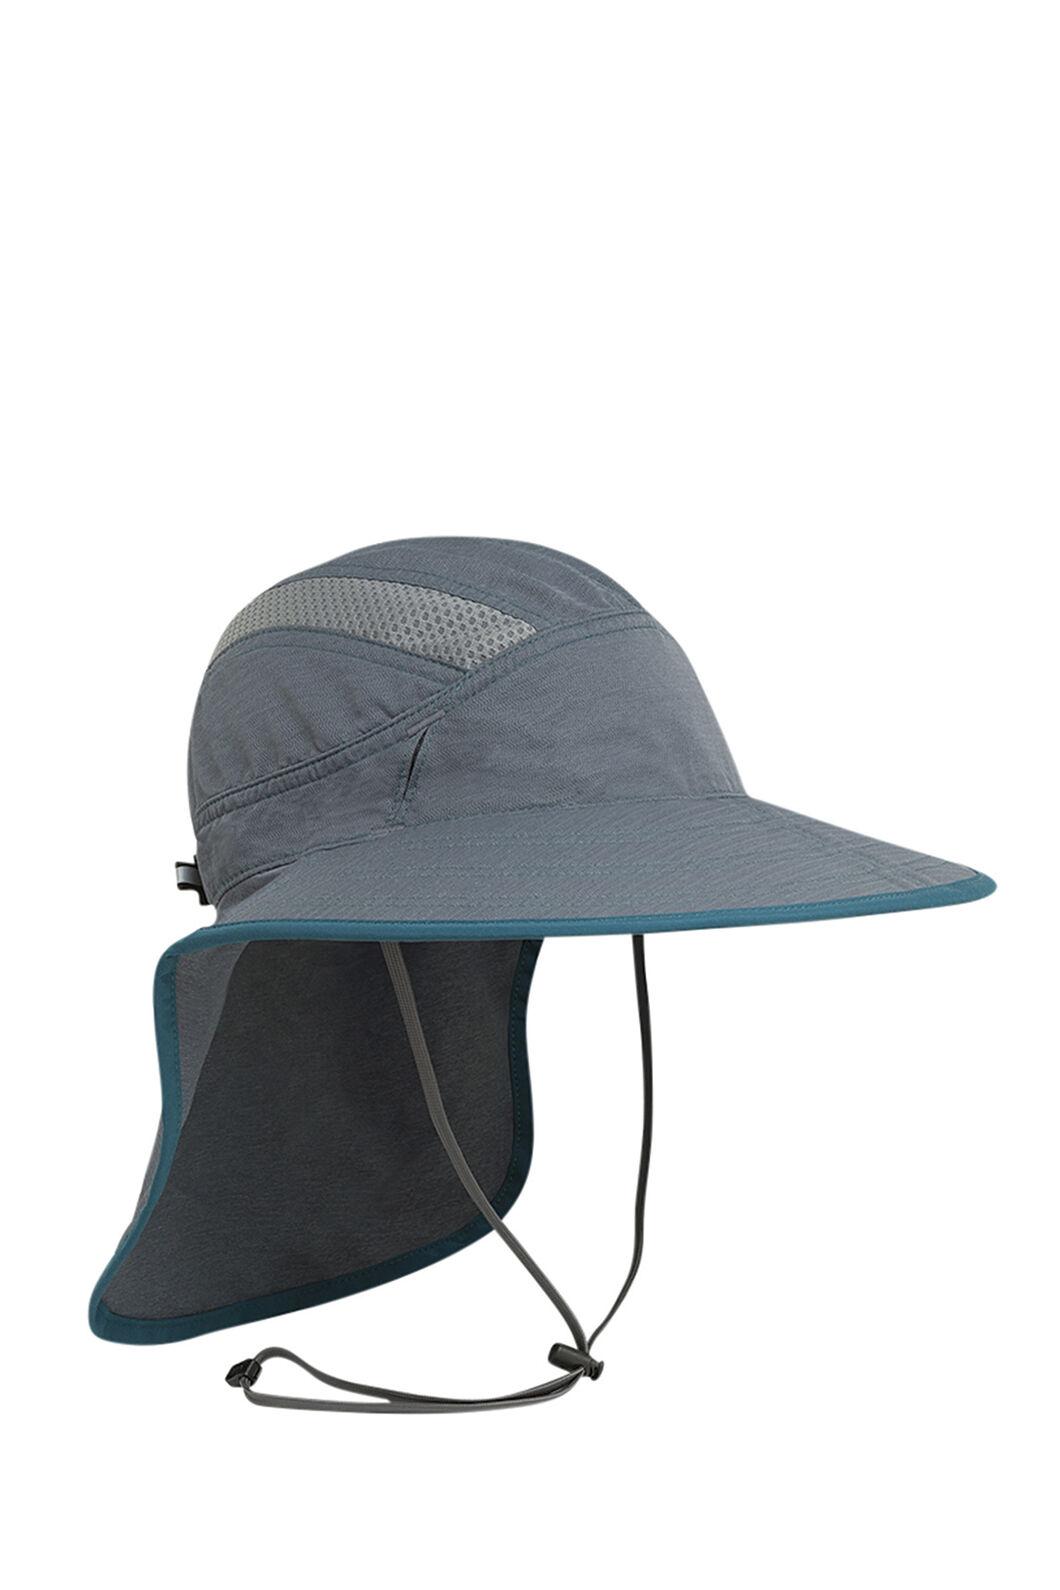 Sunday Afternoons Unisex Ultra Adventure Hat PumiceLight, CINDER/DARK GREY, hi-res